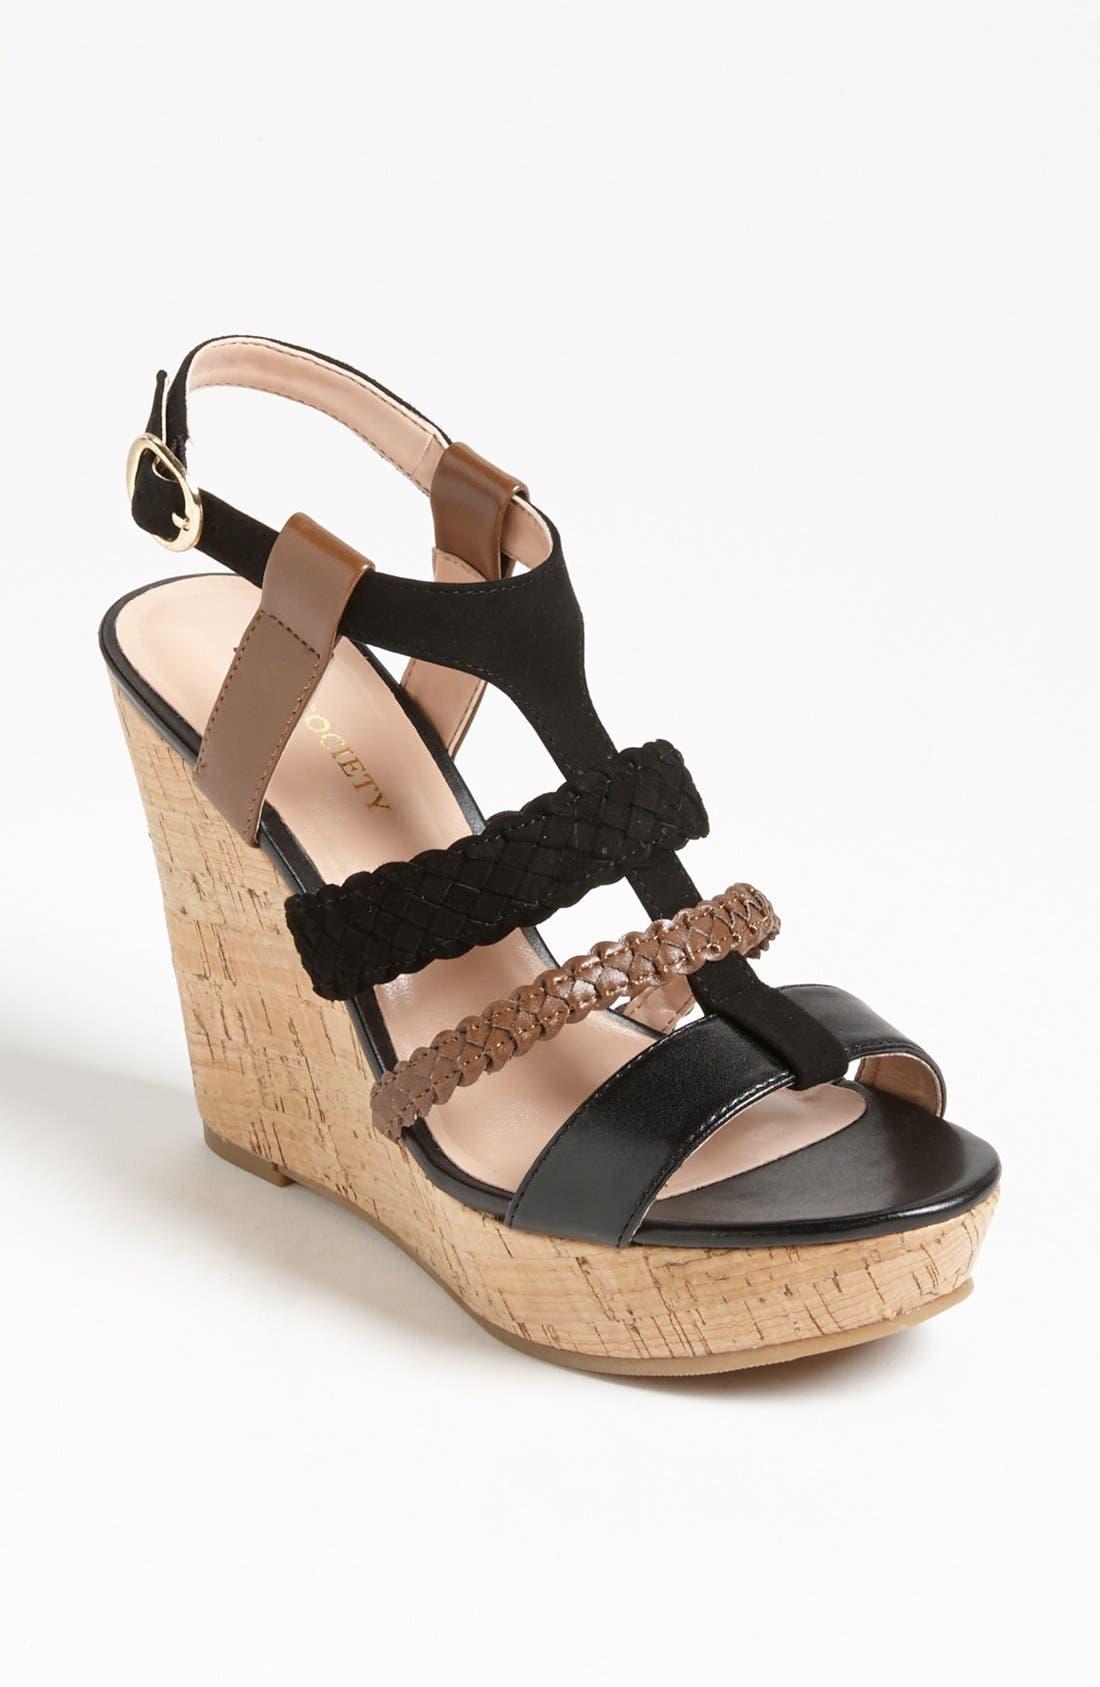 Alternate Image 1 Selected - Sole Society 'Serina' Wedge Sandal